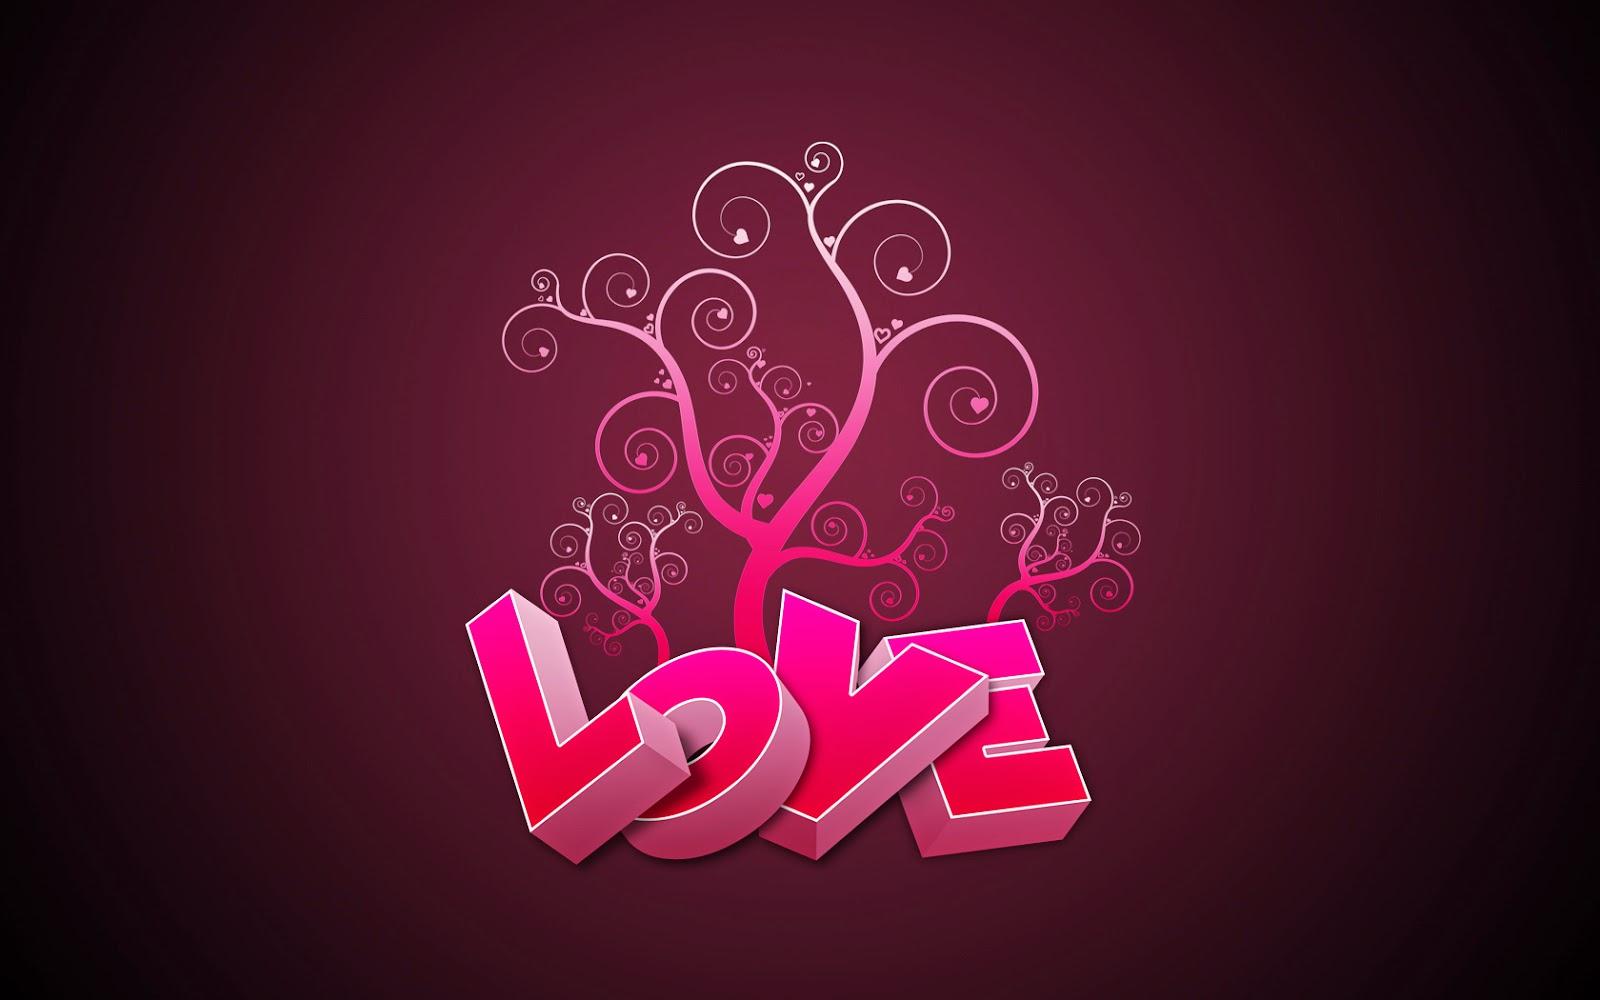 Love U Wallpapers Desktop : Love HD desktop wallpaper Picture Gallery